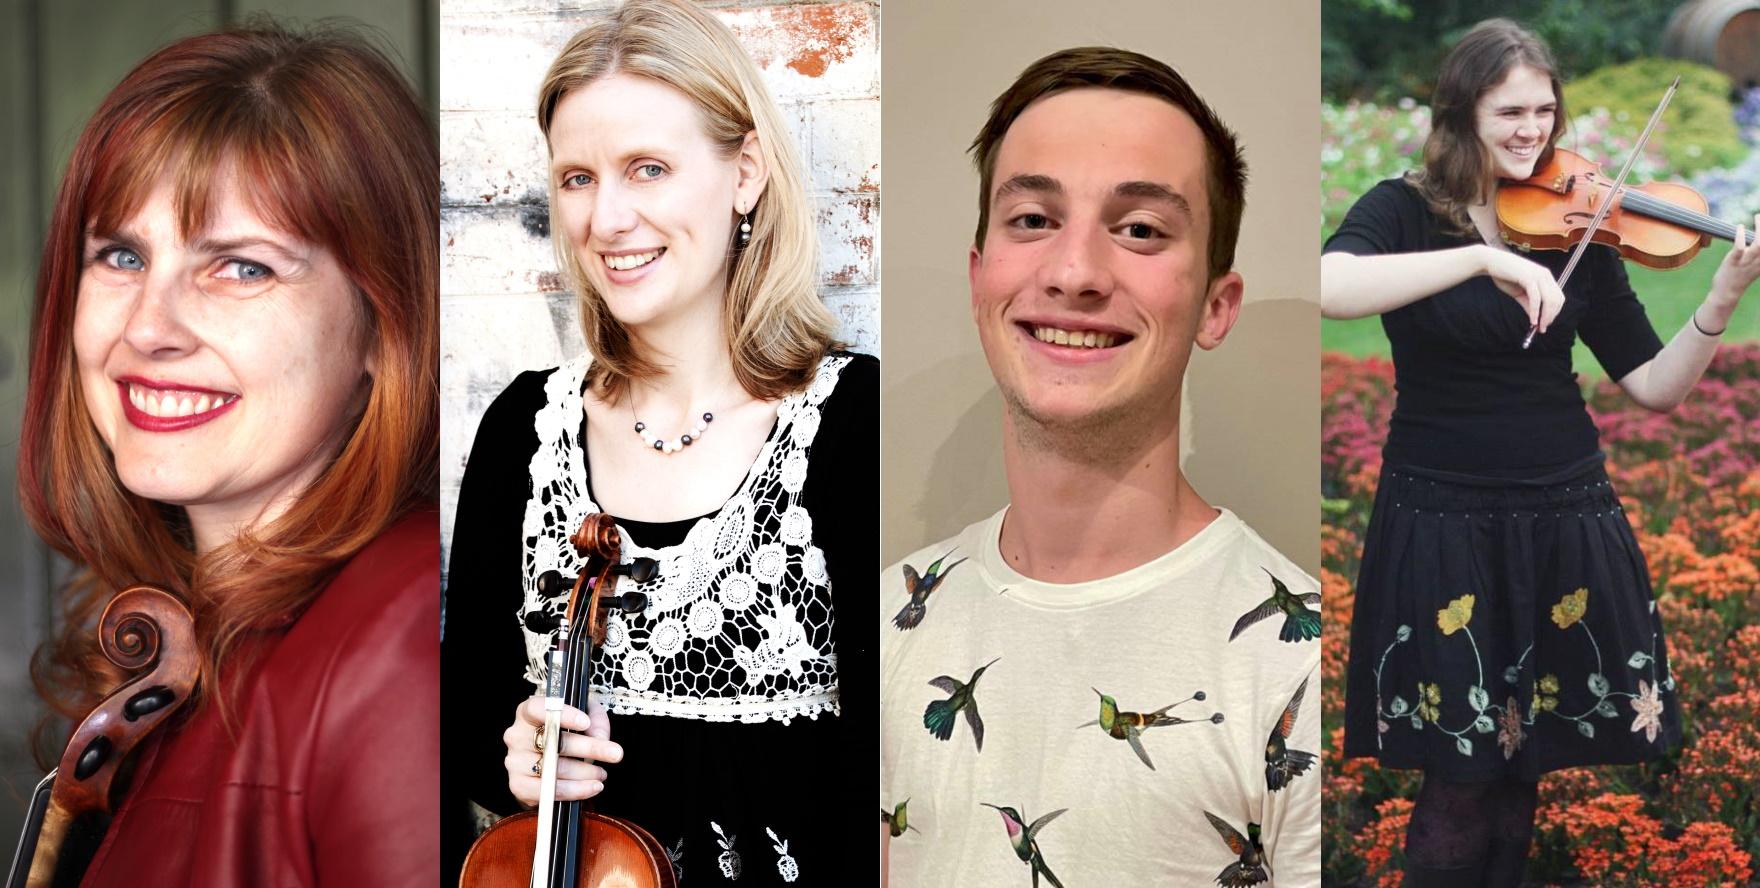 Brisbane Folk Quartet